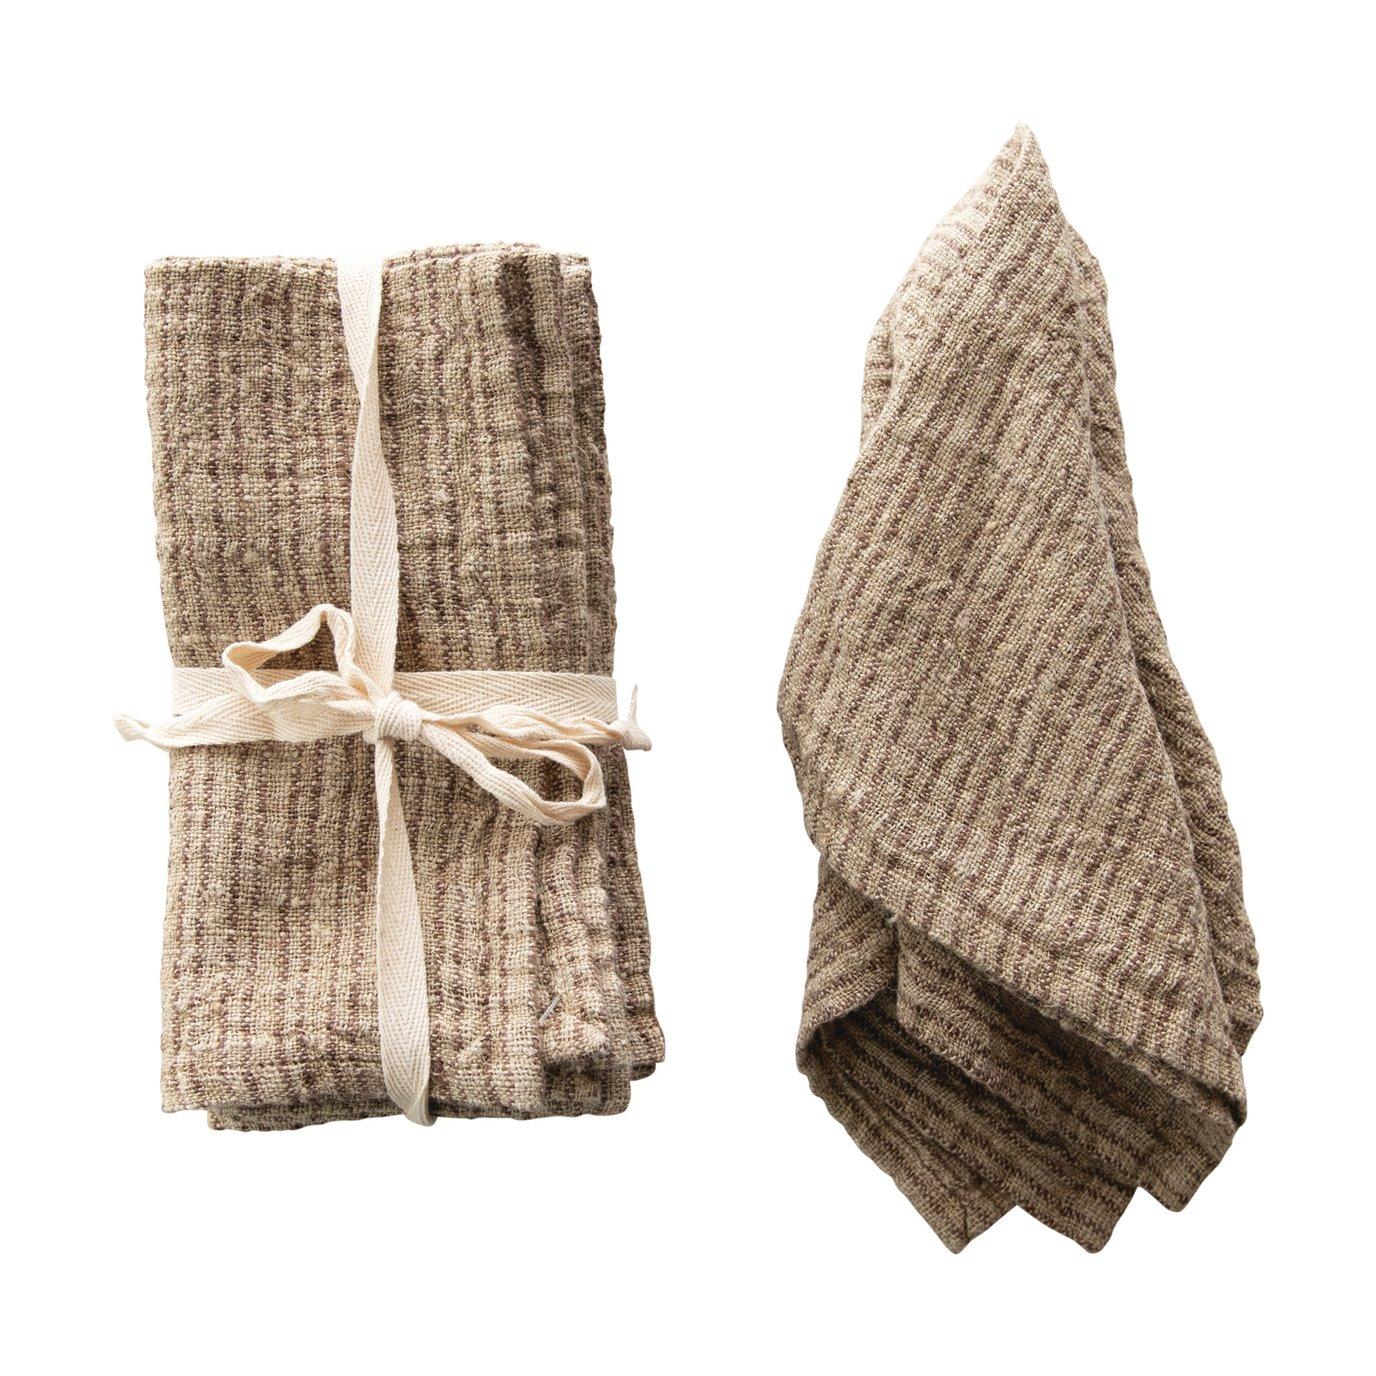 Brown Square Woven Striped Linen Napkin (Set of 4)